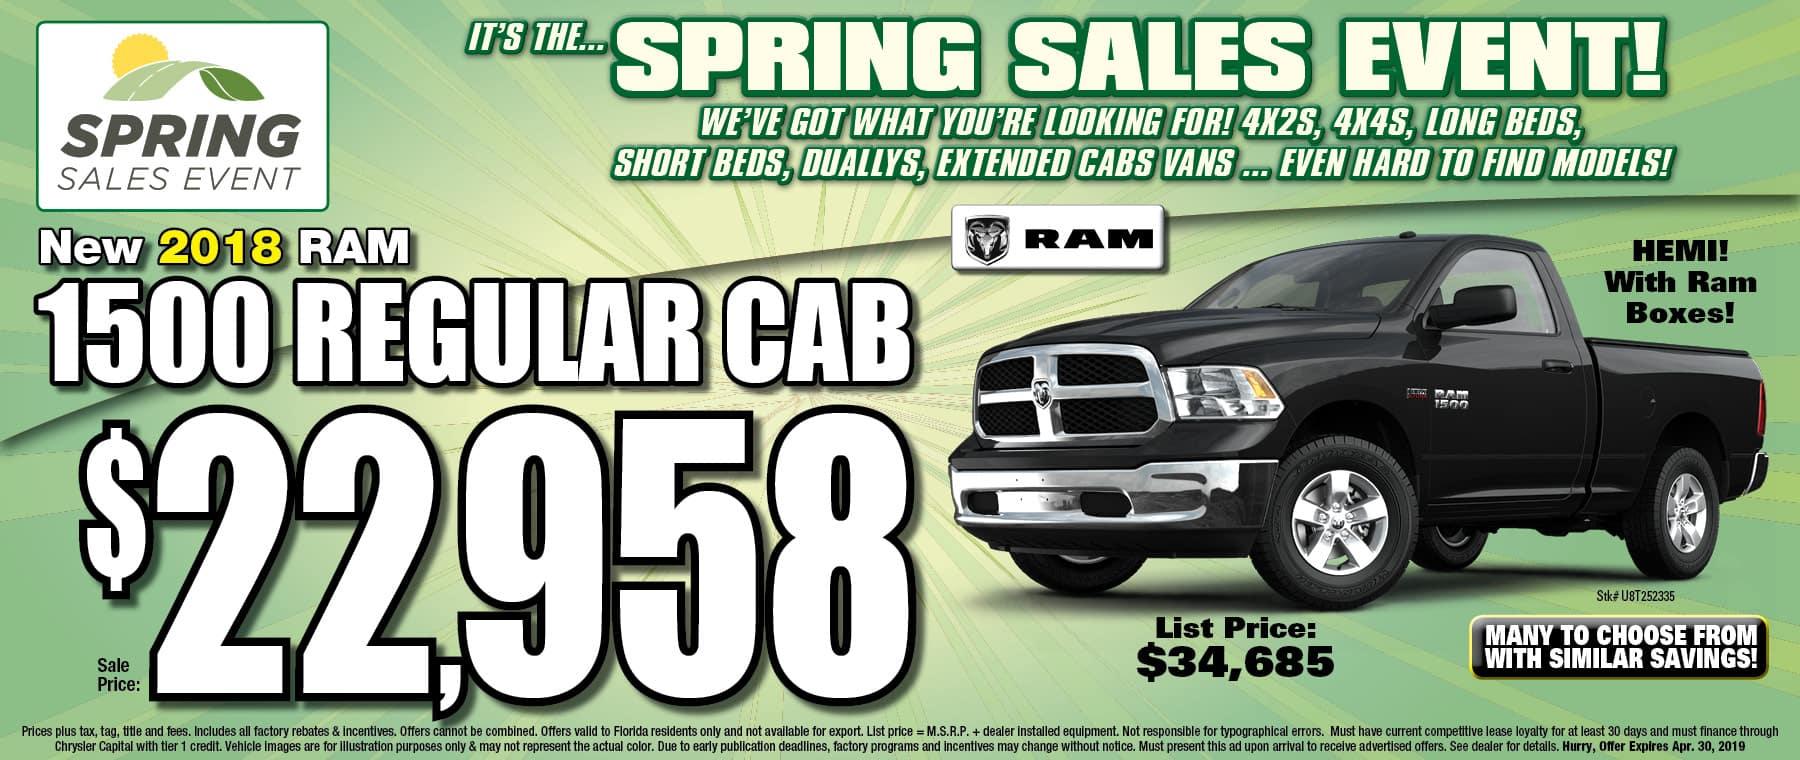 Ram Regular Cab Trucks! - University Dodge RAM!